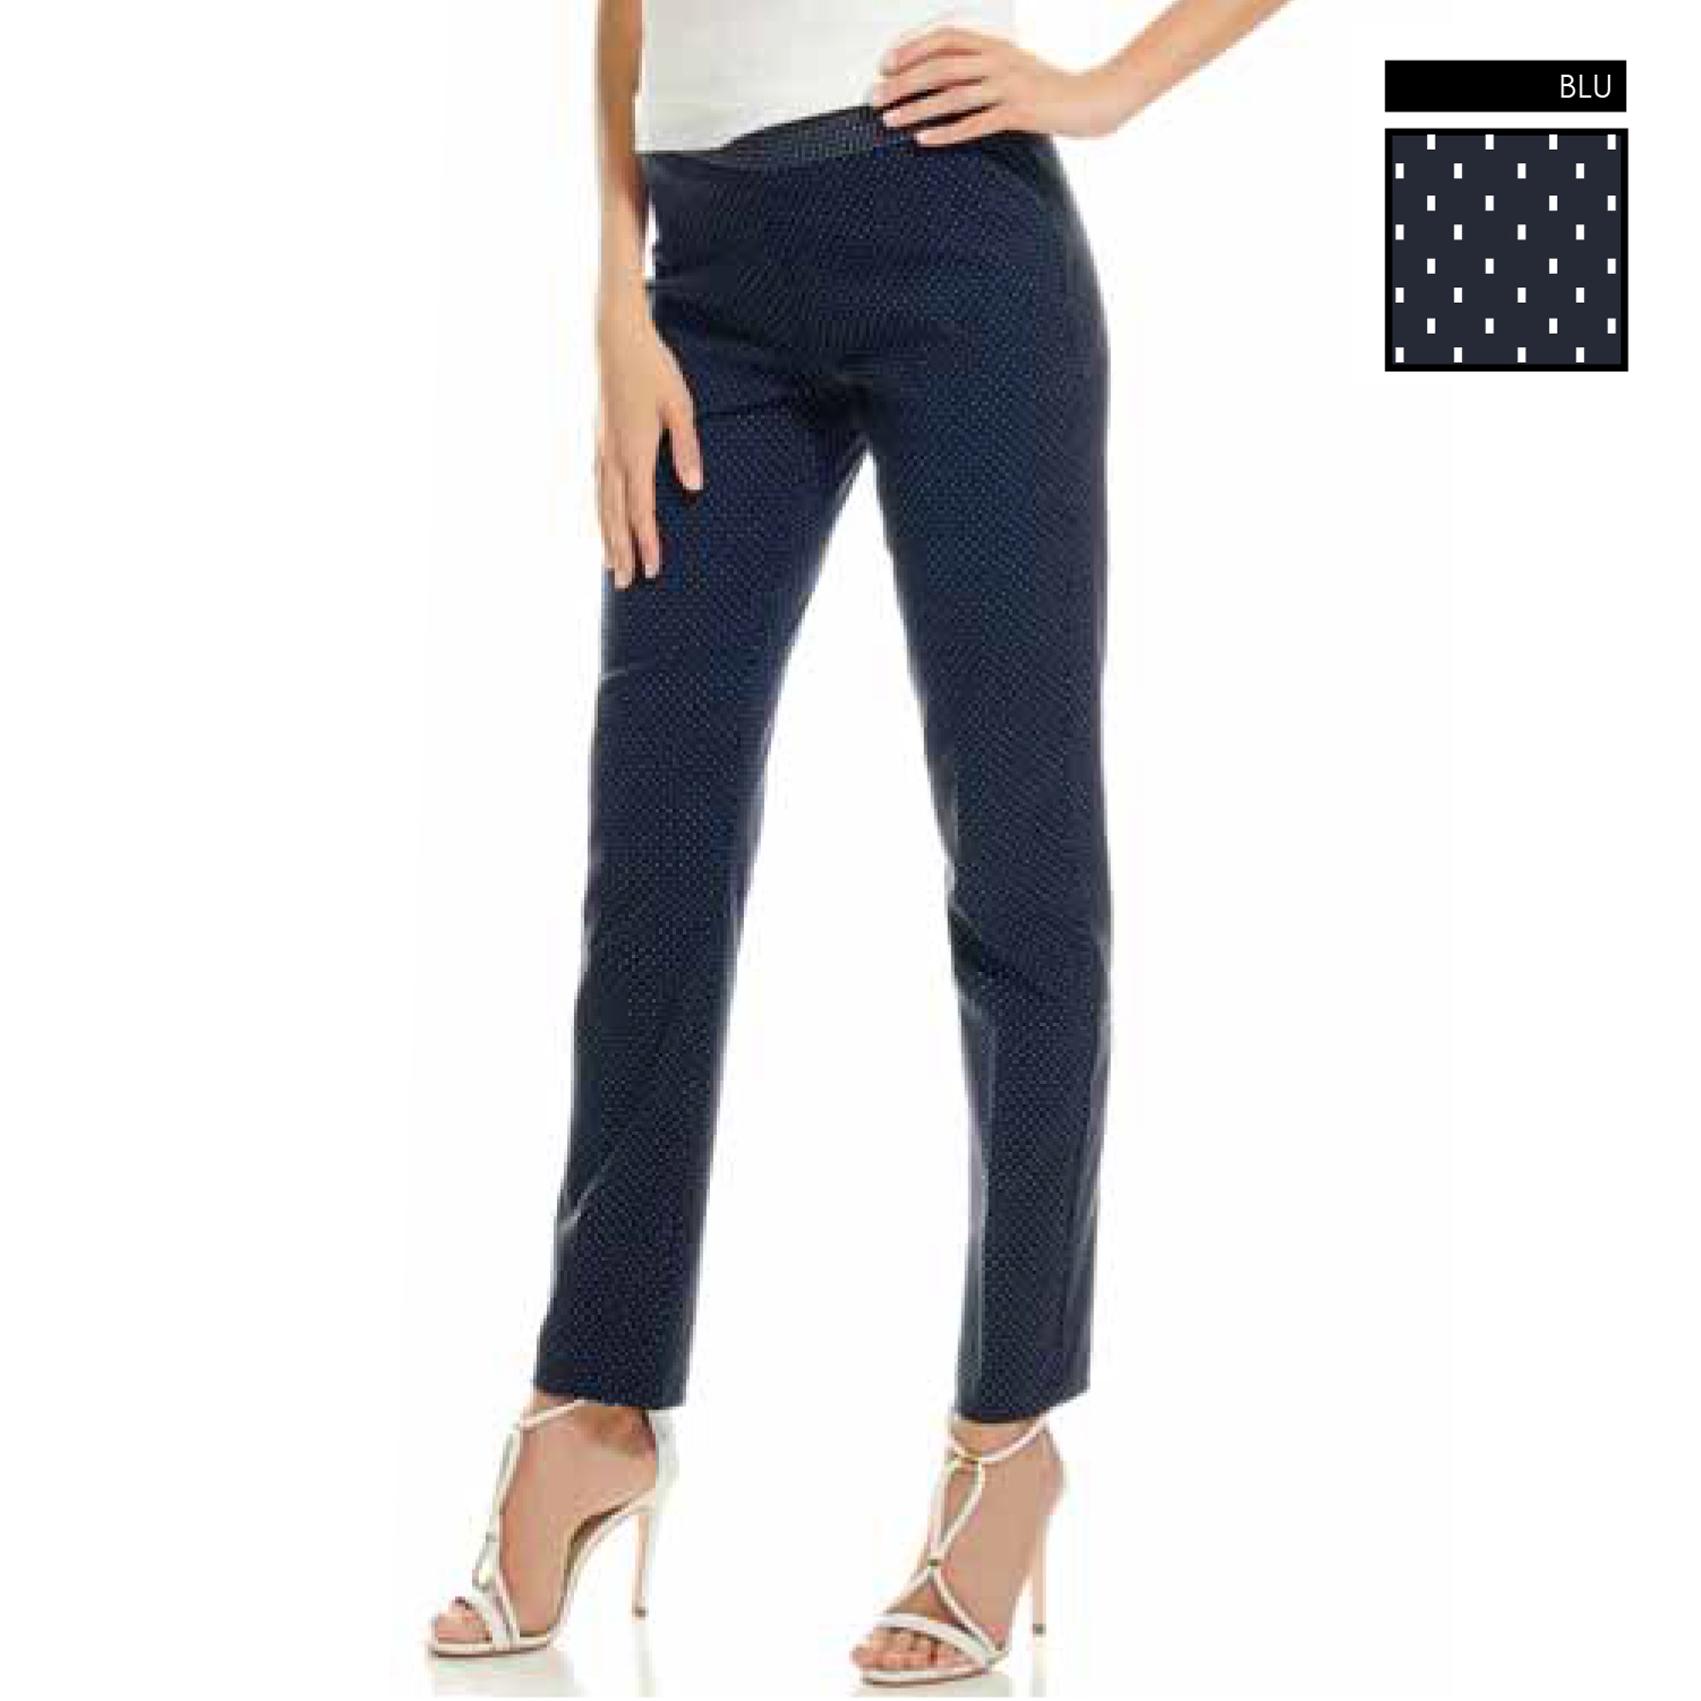 Pantalone blu Evoe